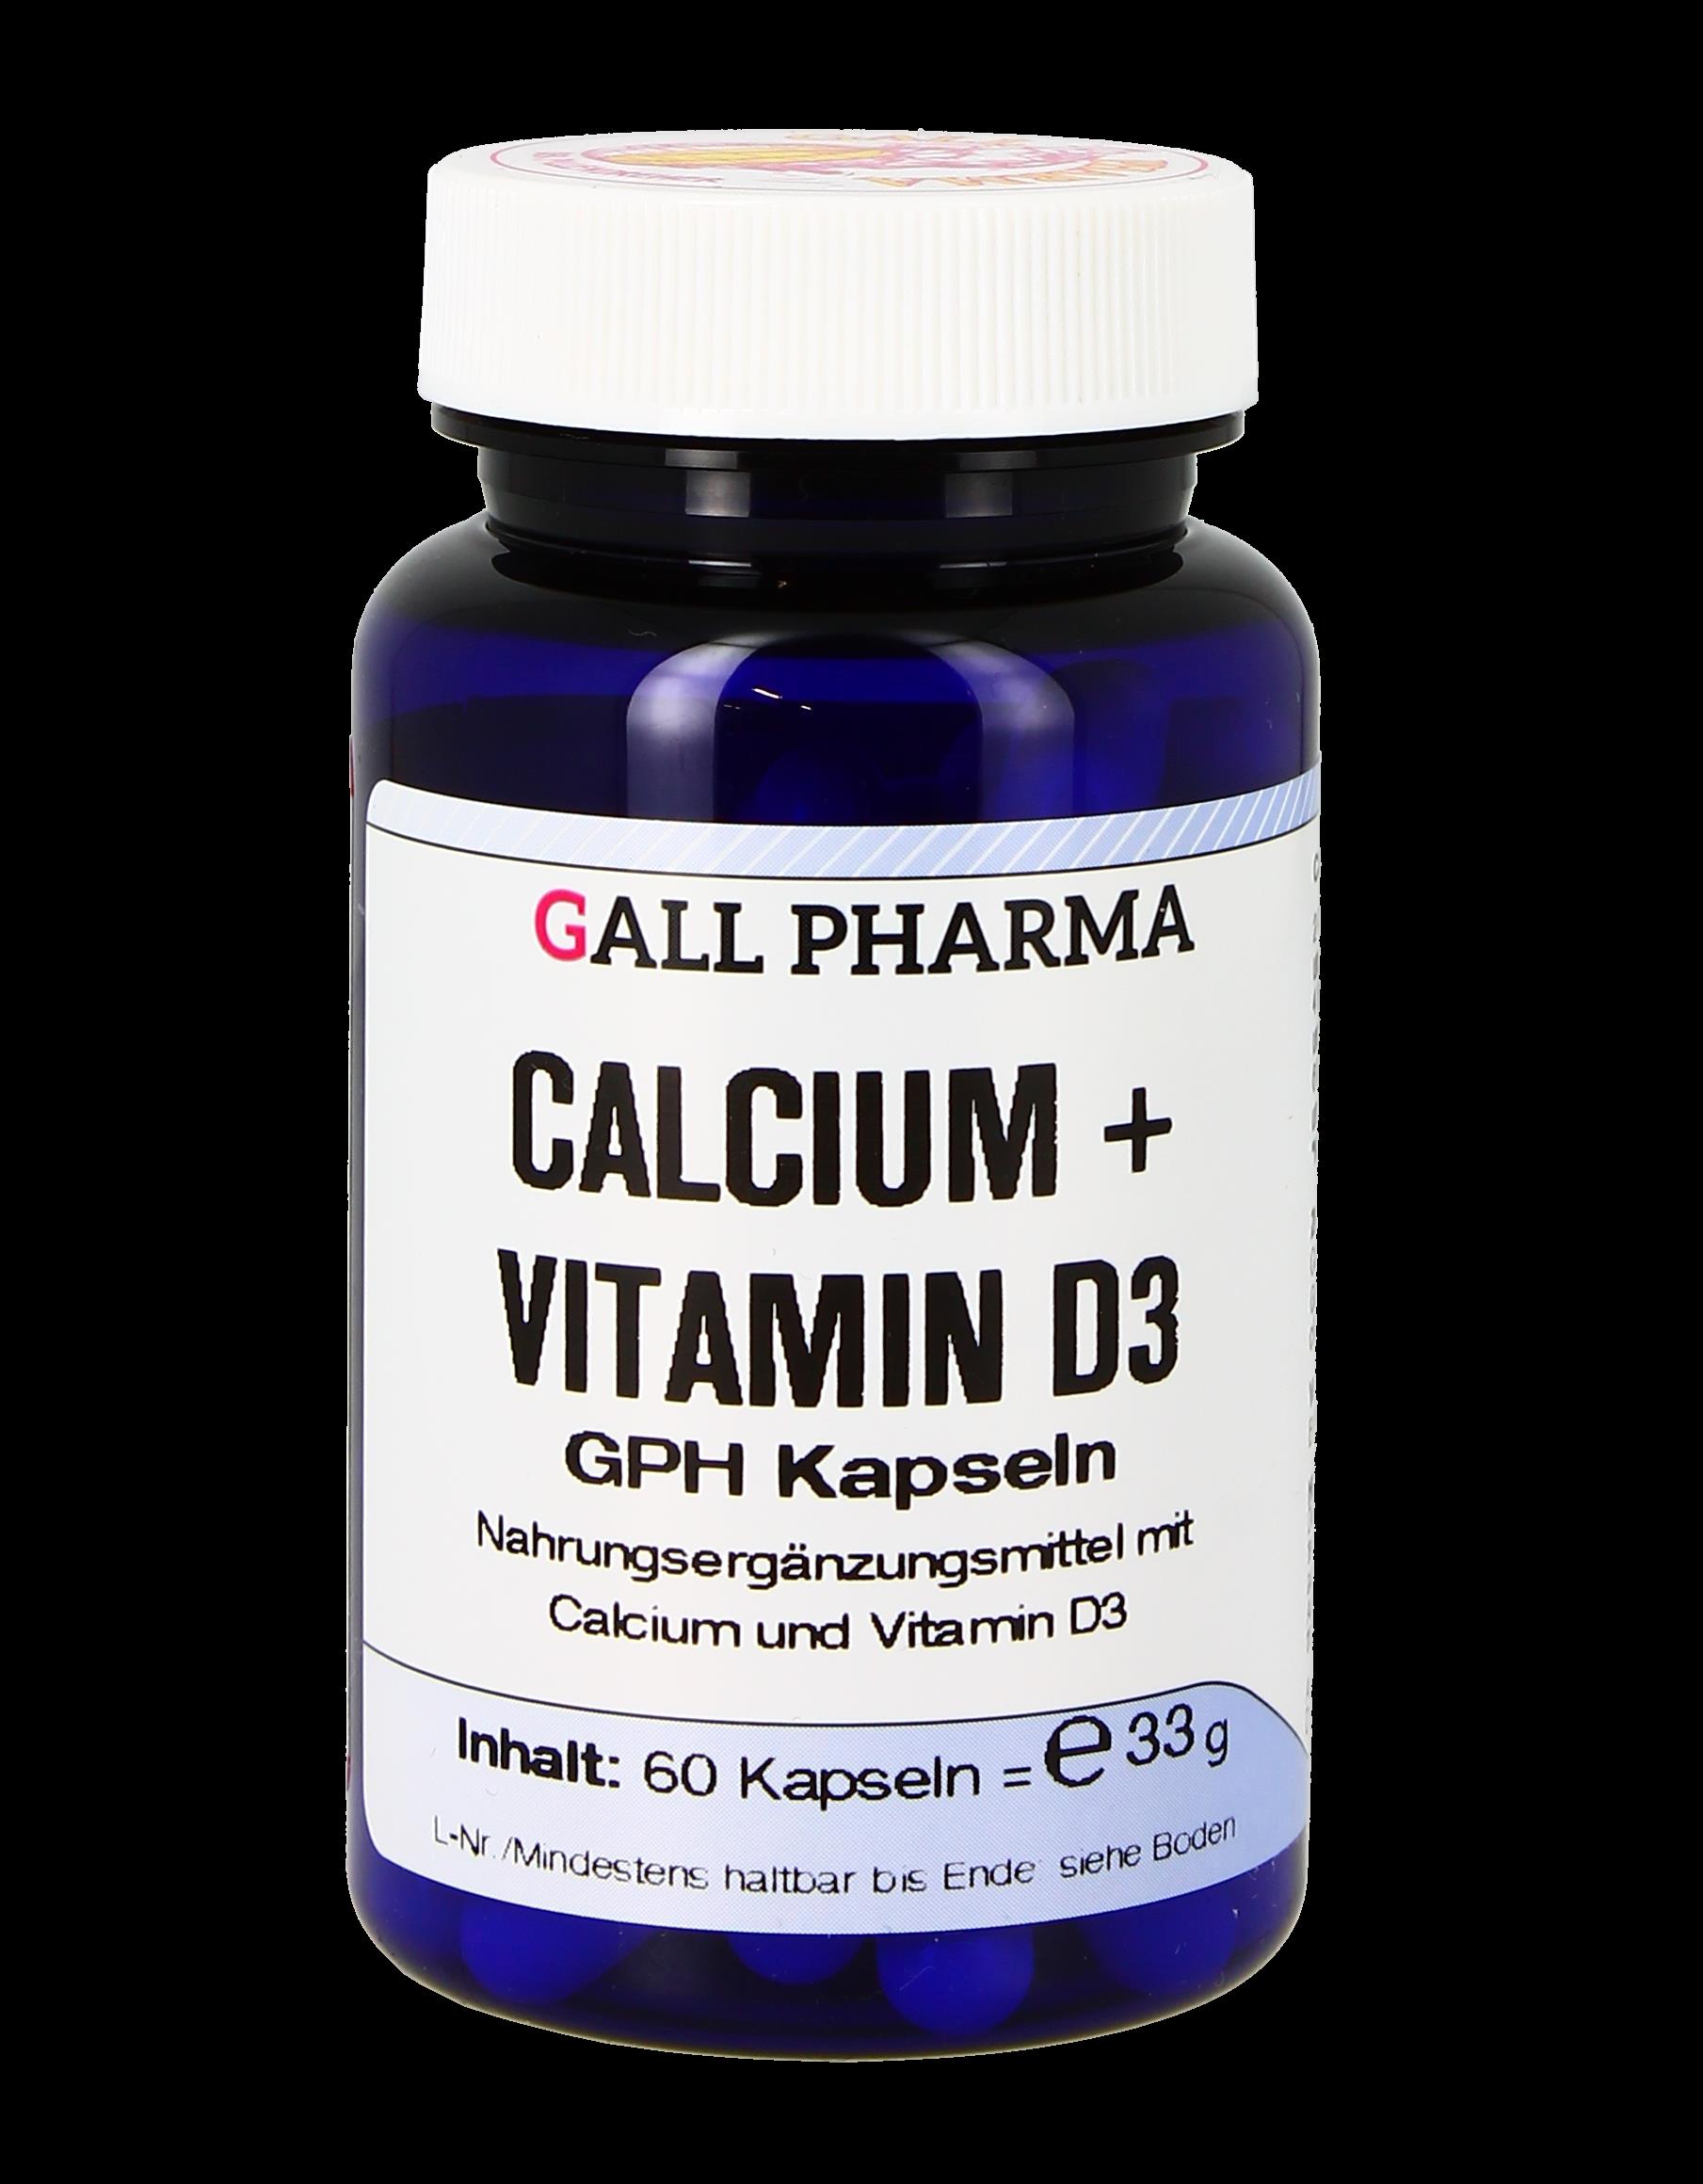 Calcium + Vitamin D3 GPH Kapseln